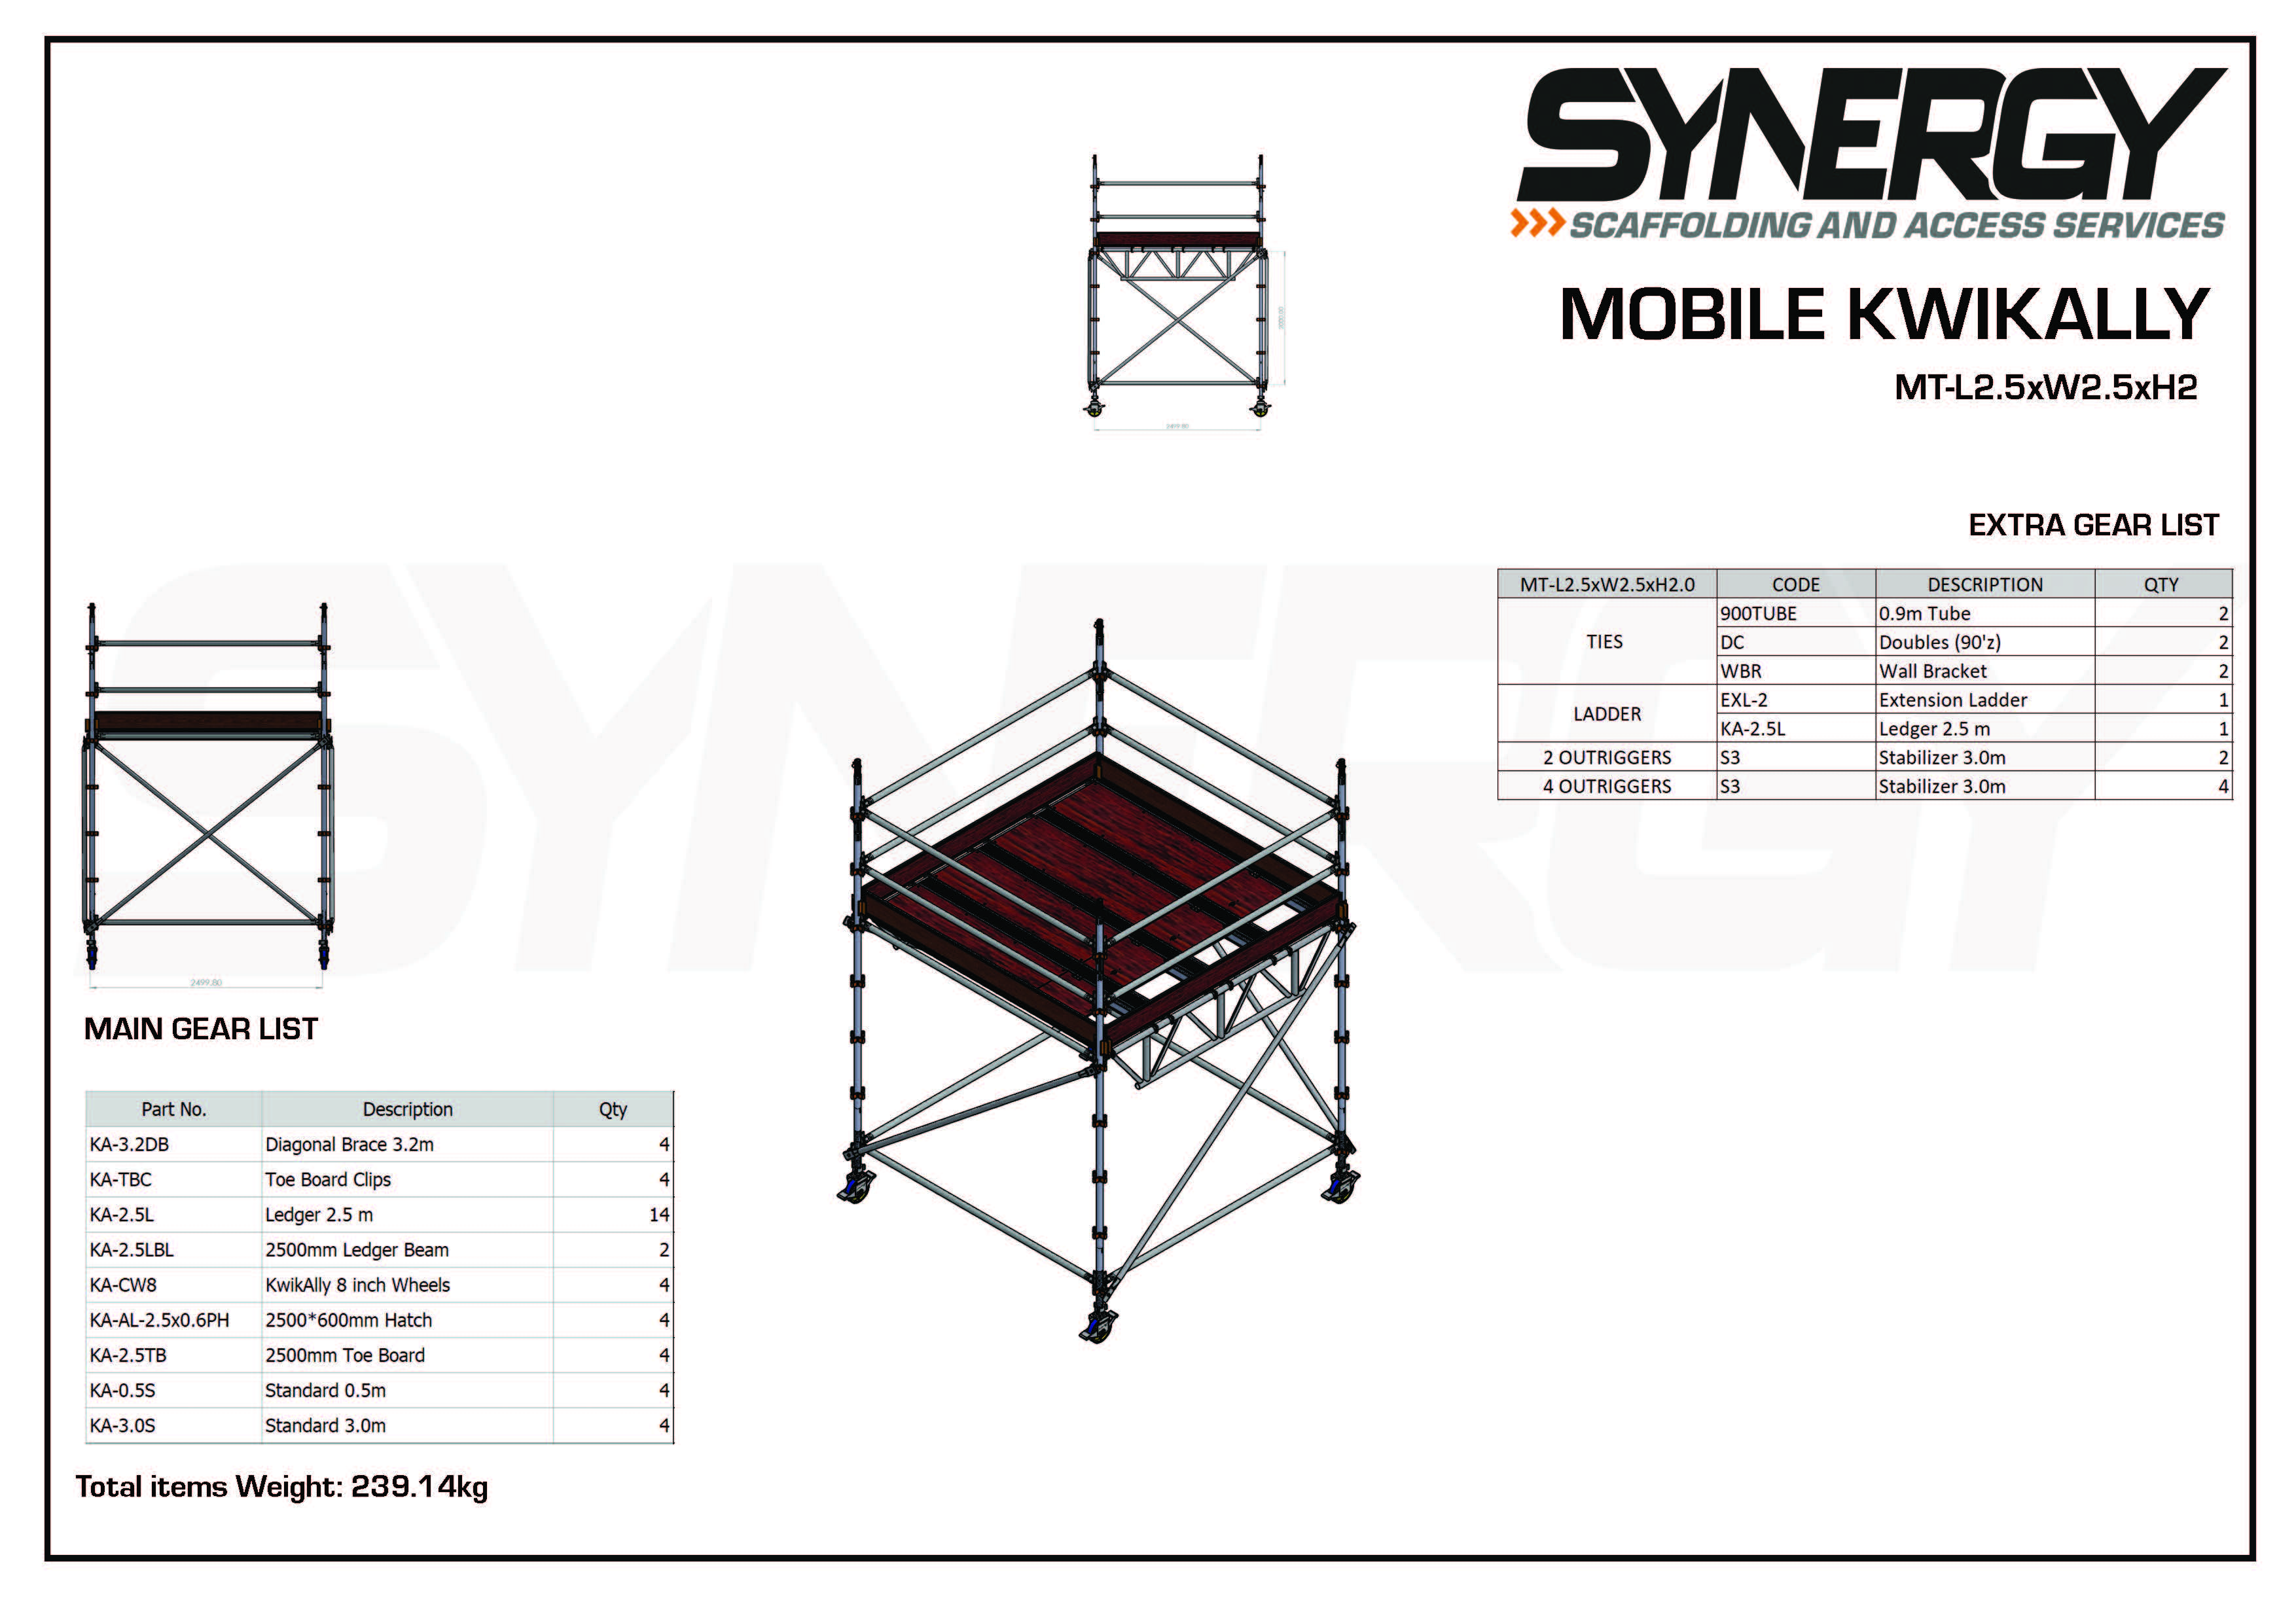 Kwikally Mobile 2.5m x 2.5m x 2m(Height)